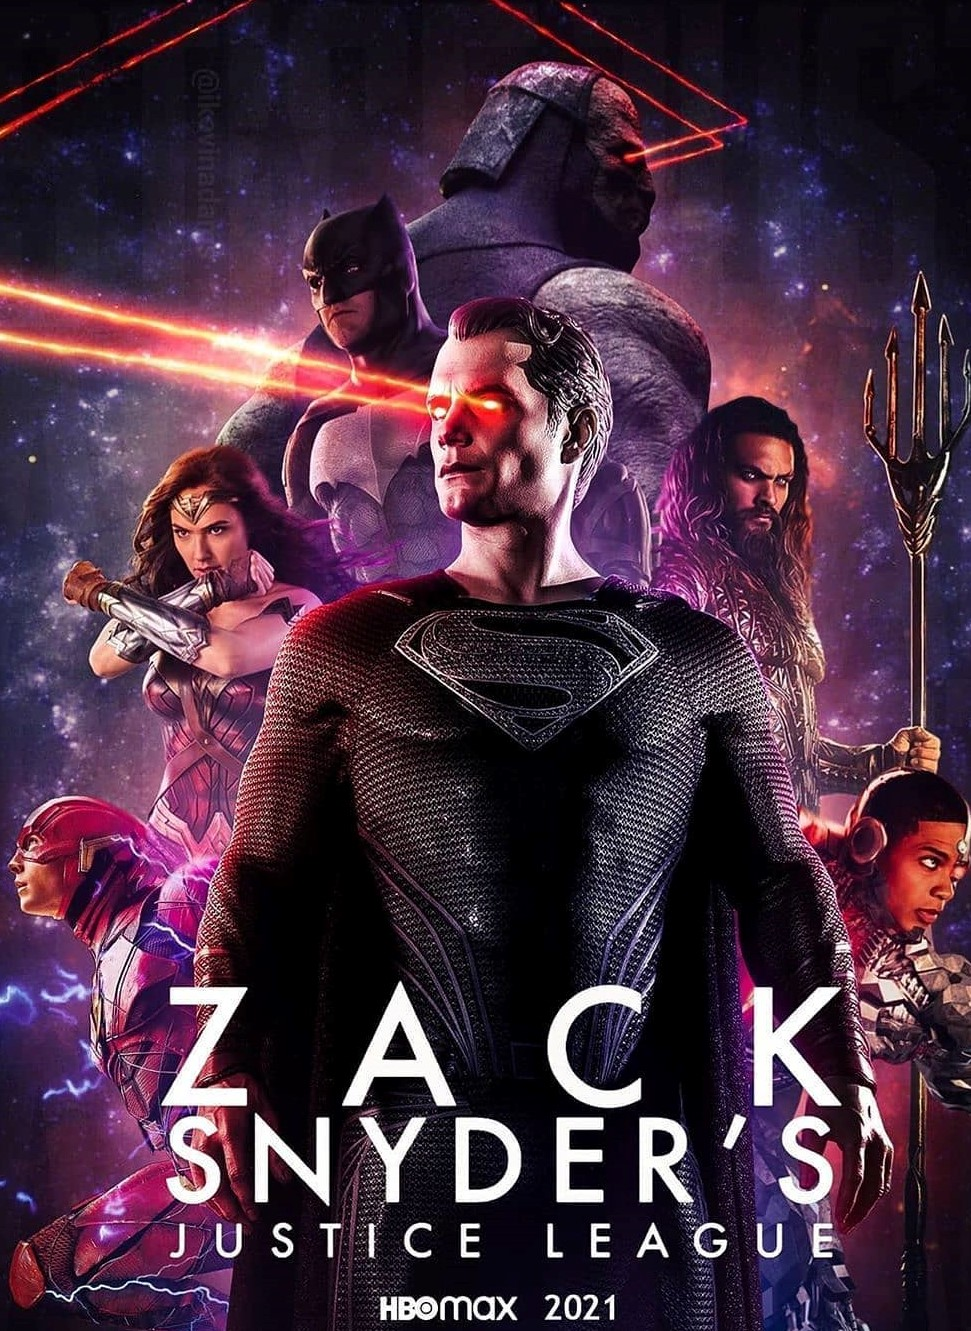 Liga da Justiça: Snyder Cut - Poster